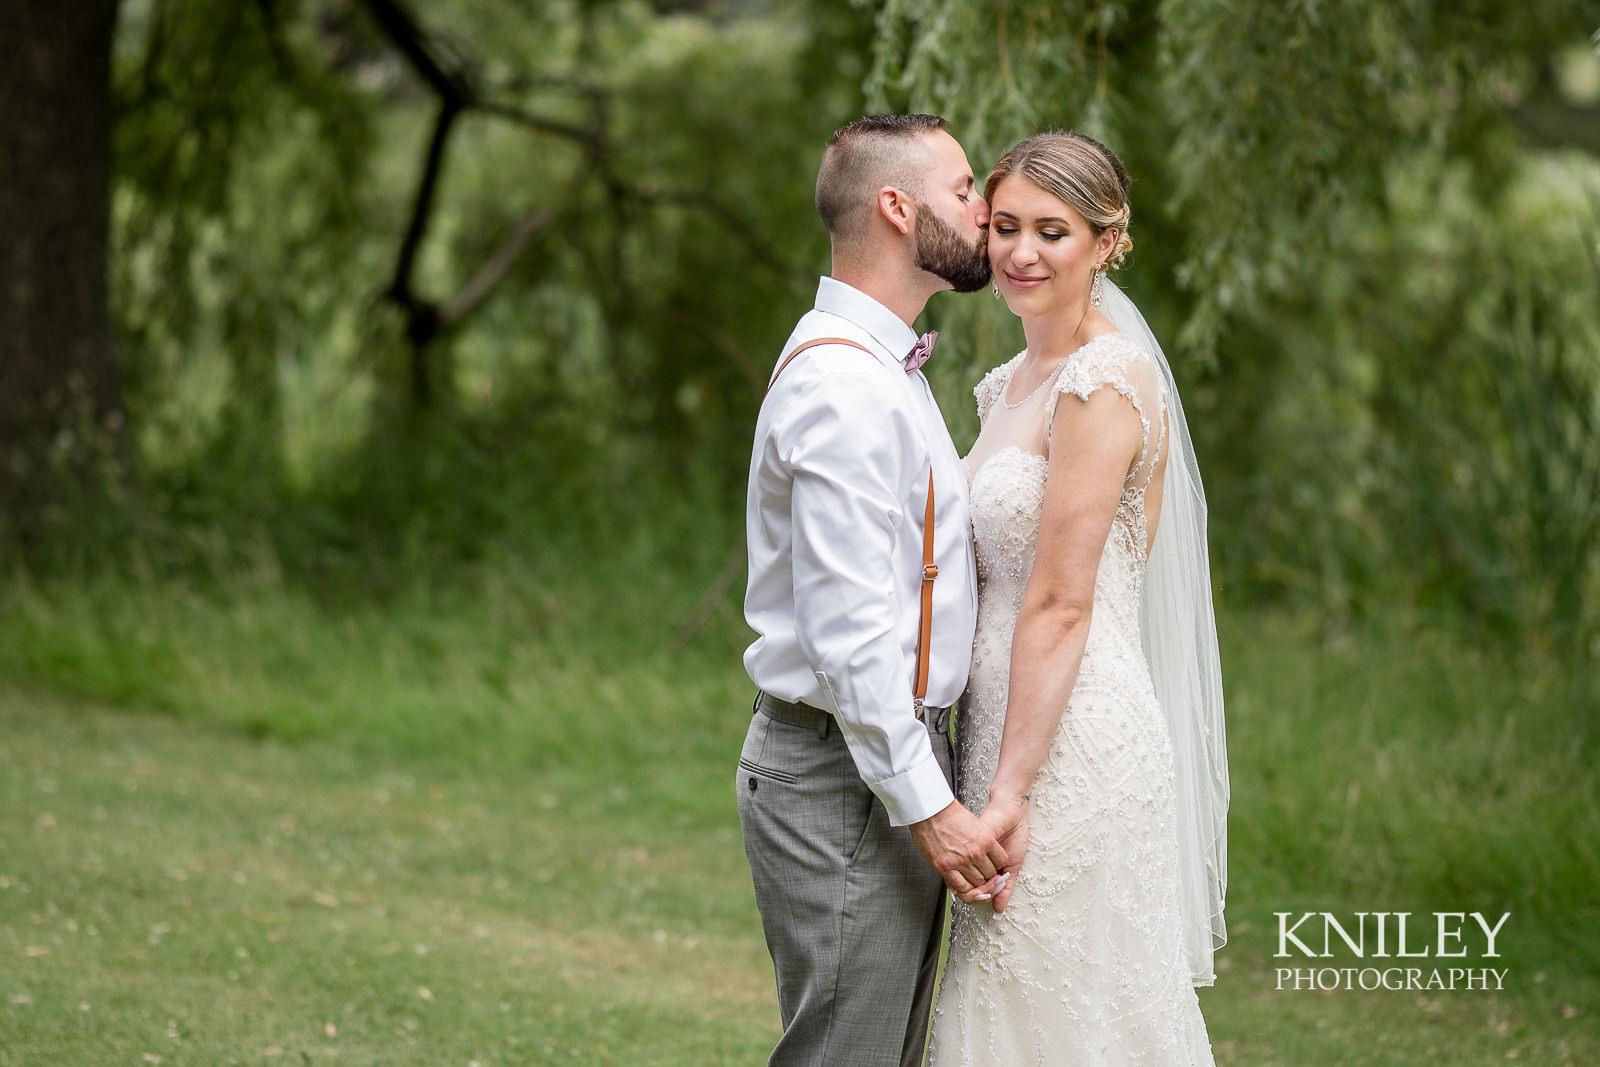 070 - Ontario Golf Club Wedding Pictures - XT2B8702.jpg